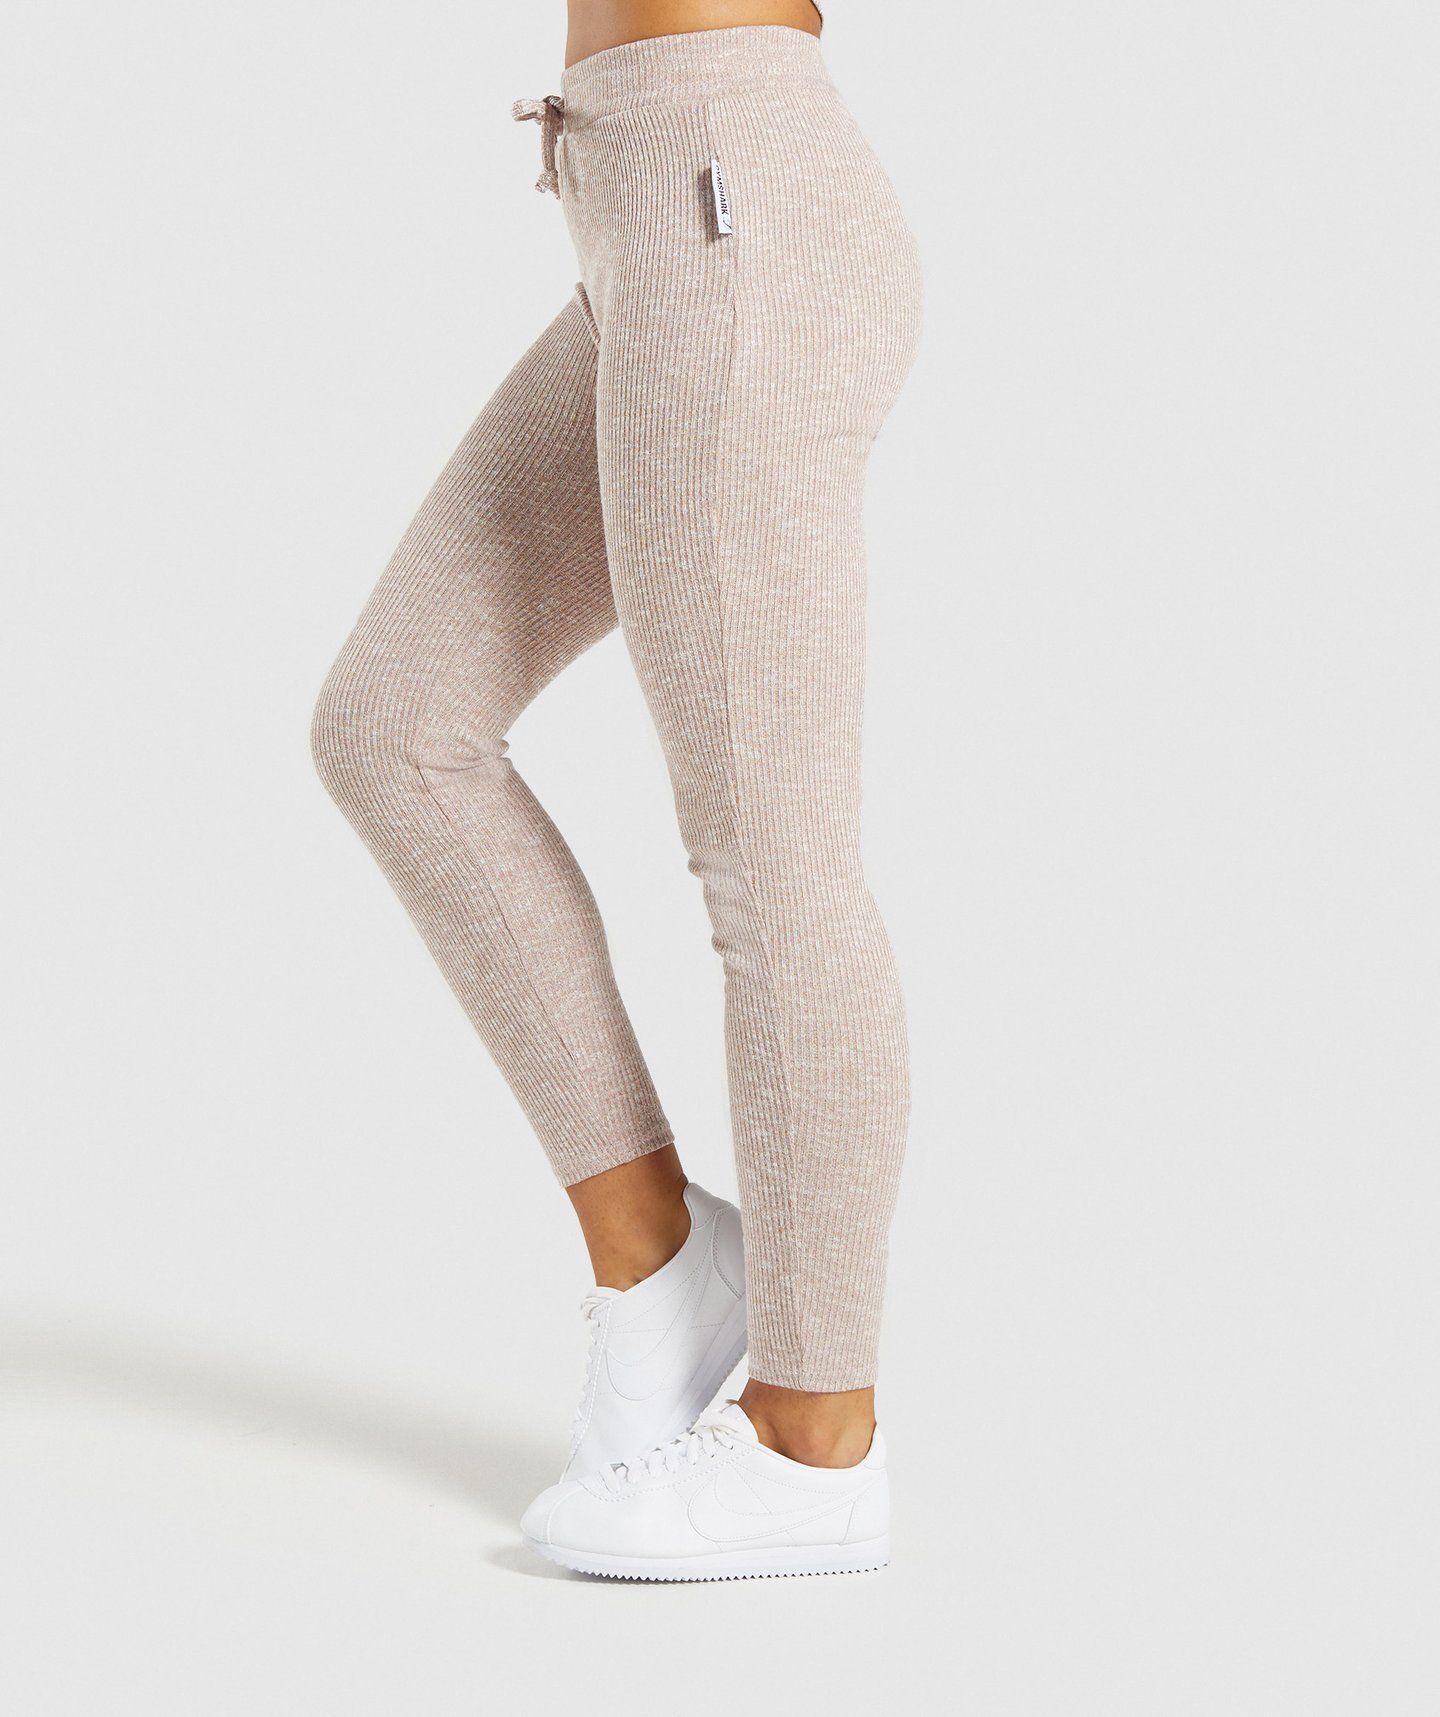 ed345dcba48d50 Gymshark Slounge Leggings - Taupe Marl in 2019 | Wish list ...